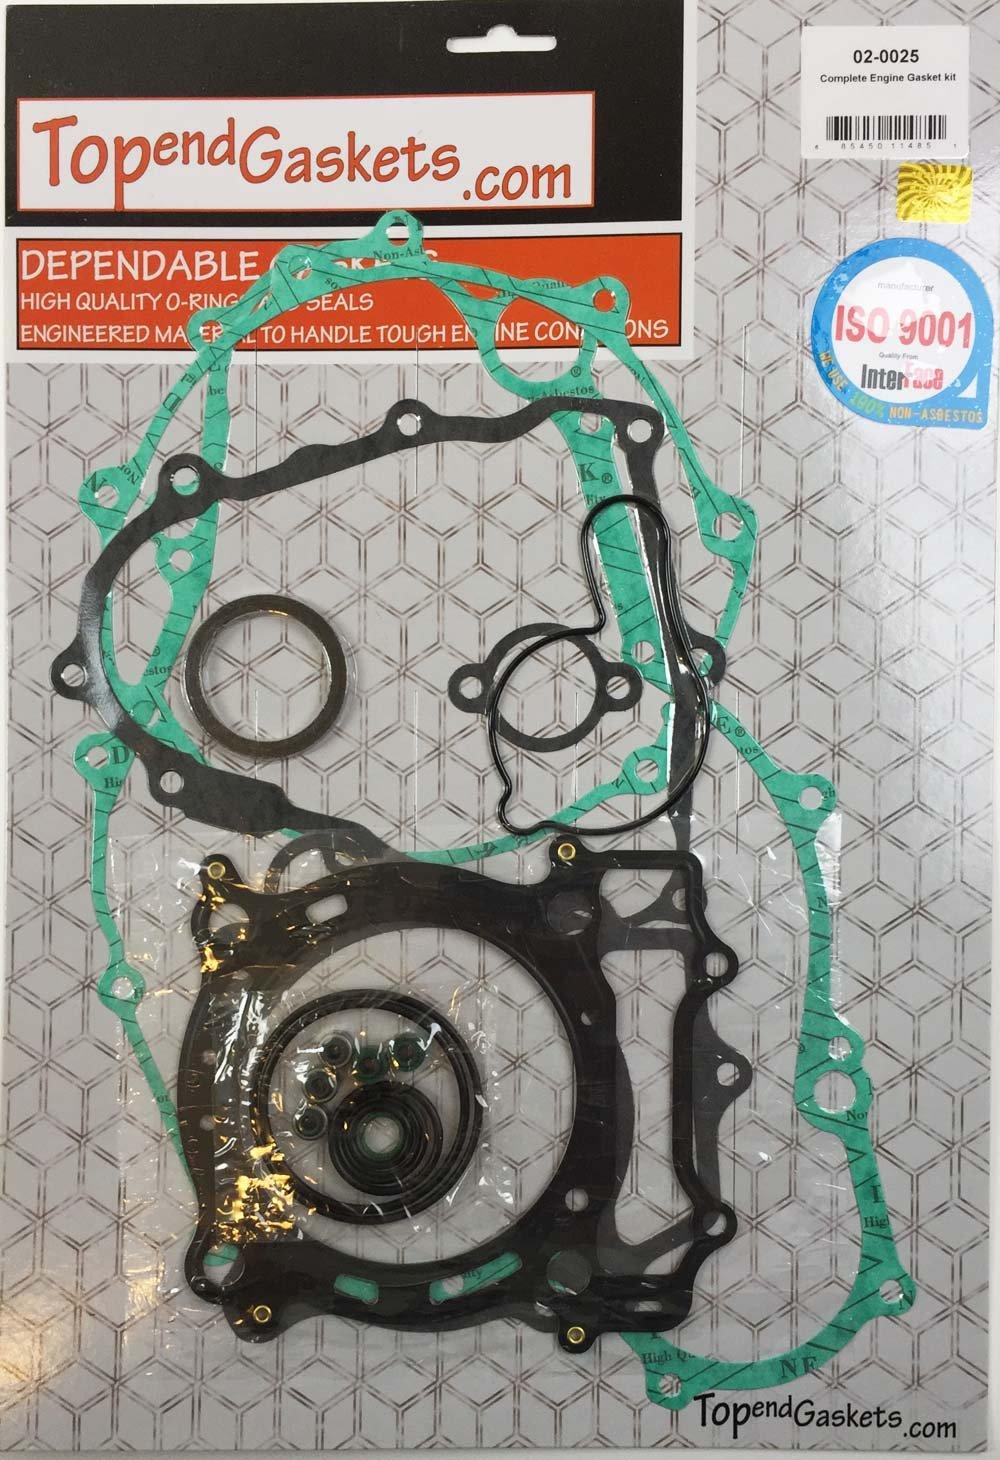 Complete Engine Gasket Kit Set Yamaha YFZ 450 2004 2005 2006 2007 2008 2009 2010